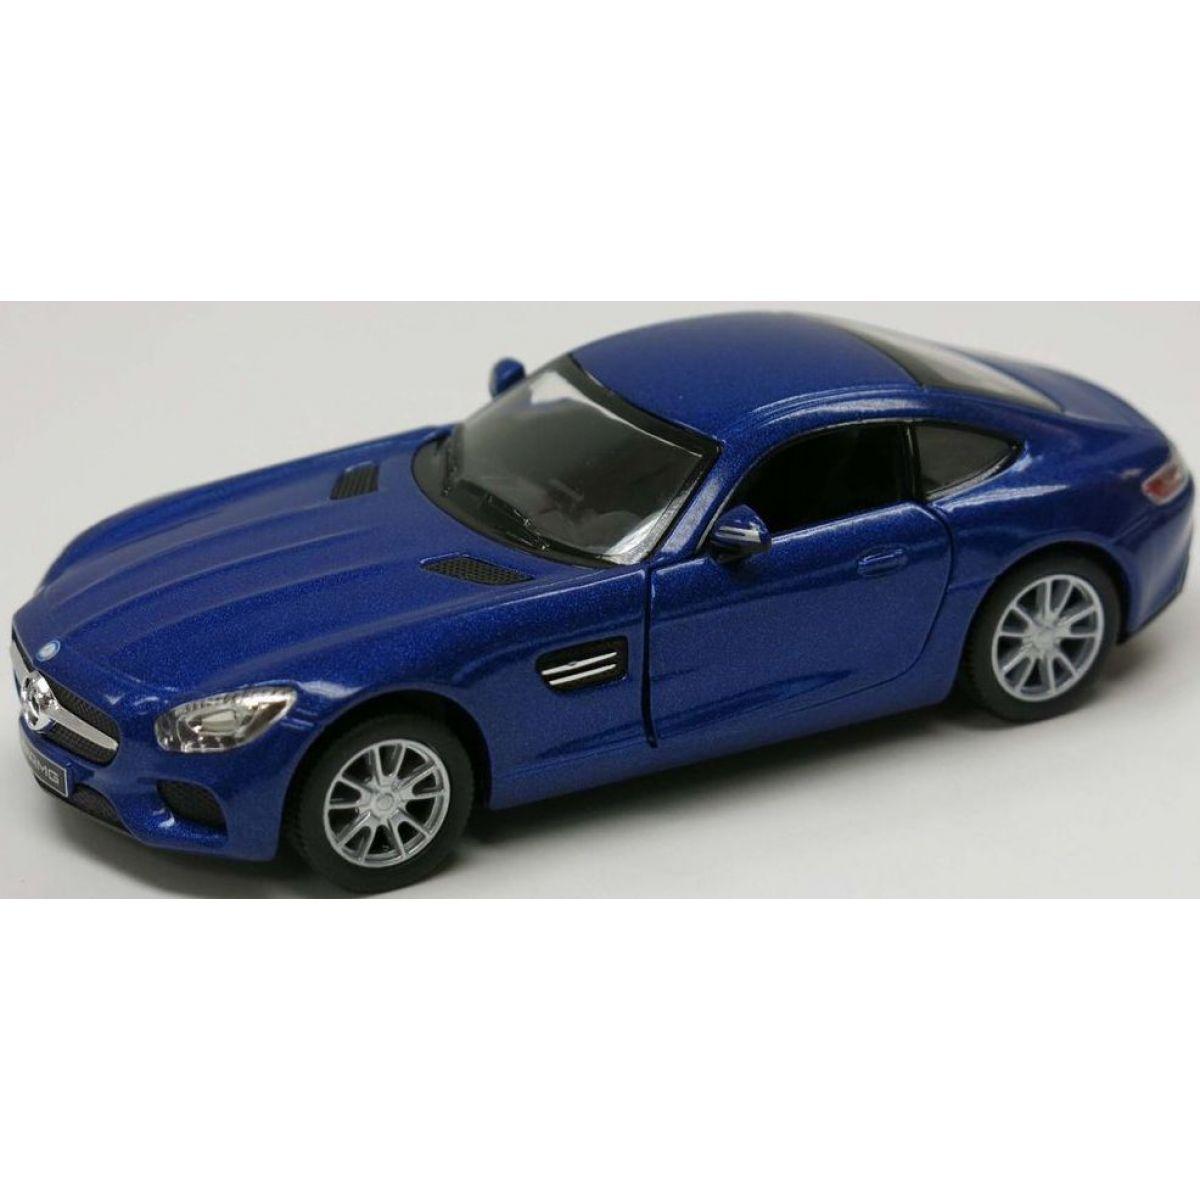 HM Studio Mercedes AMG GT modrý